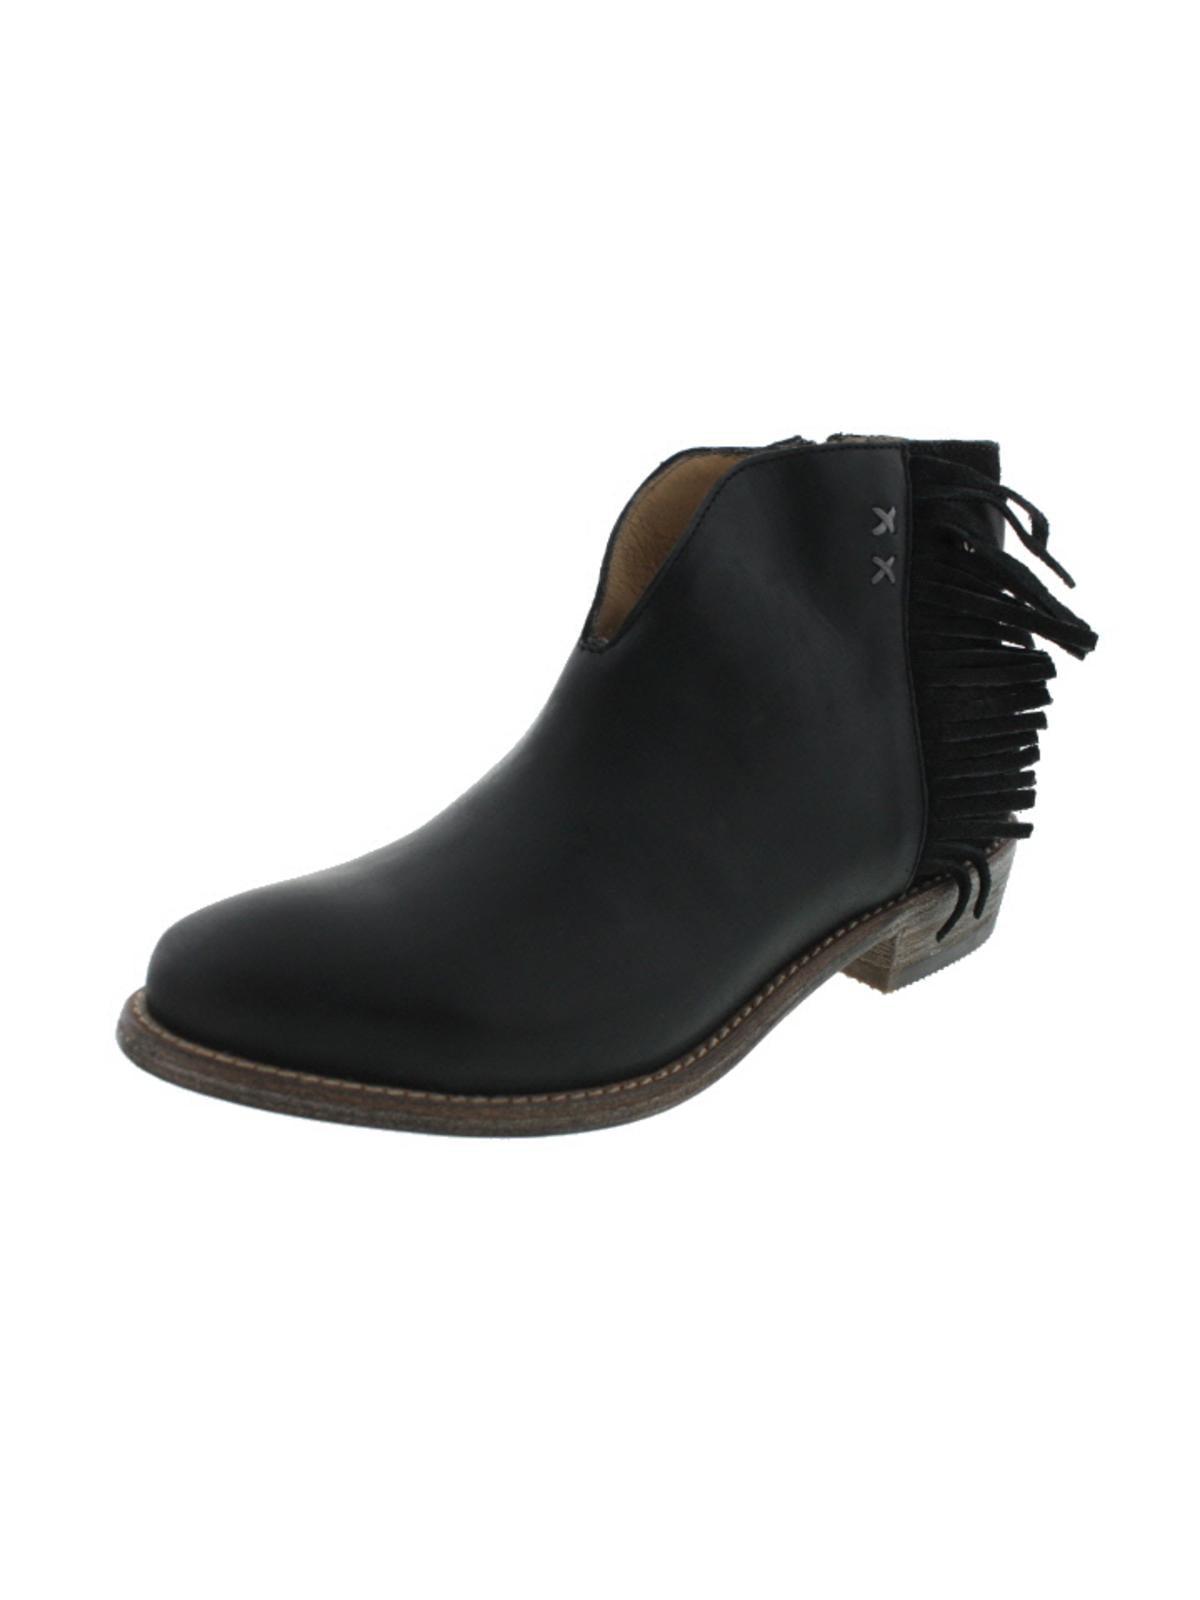 Koolaburra Womens Dallas Leather Fringe Ankle Boots by Koolaburra